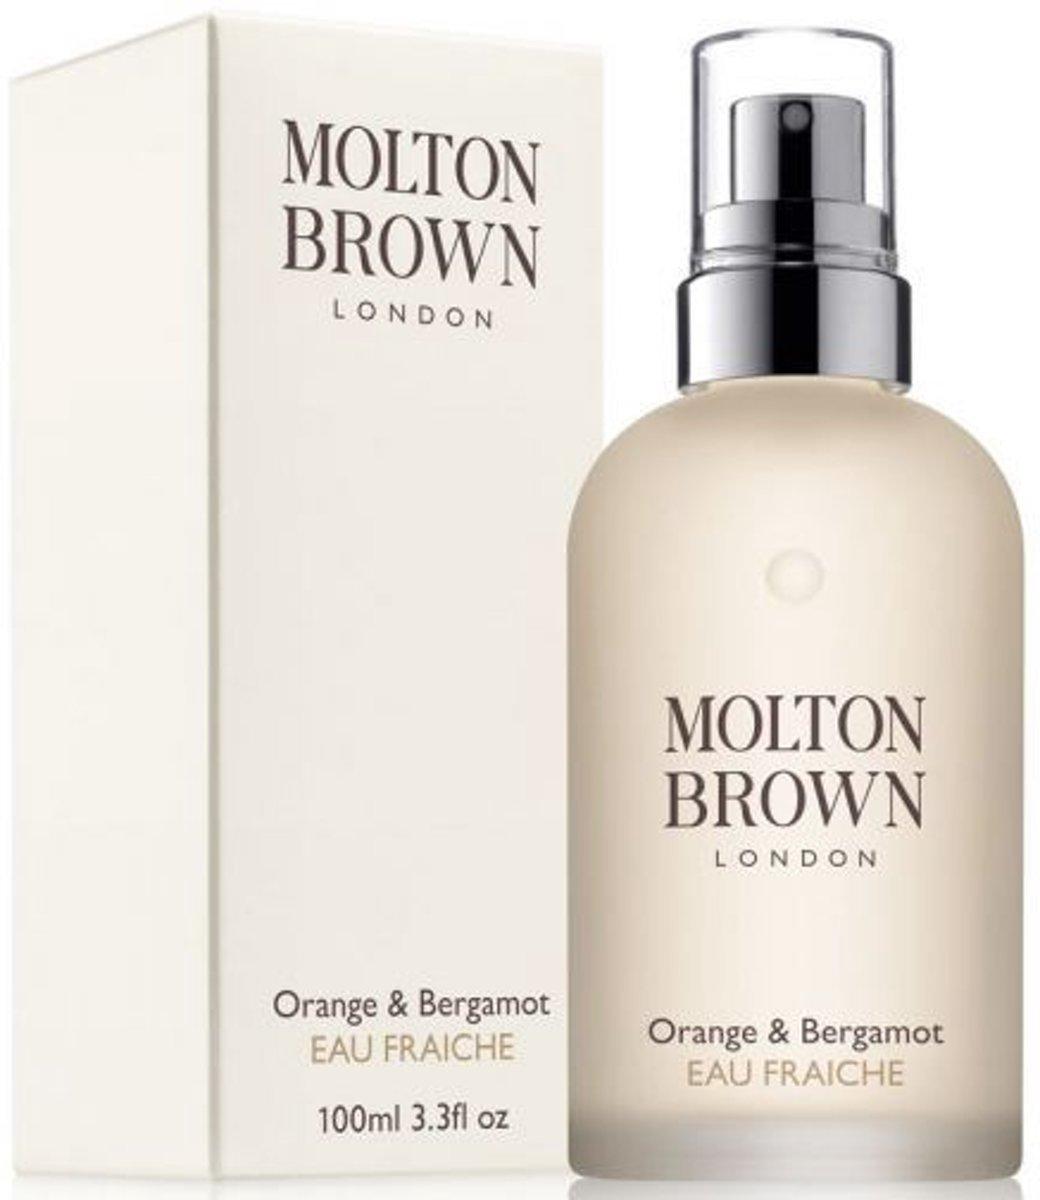 | Molton Brown Orange & Bergamot Eau Fraiche